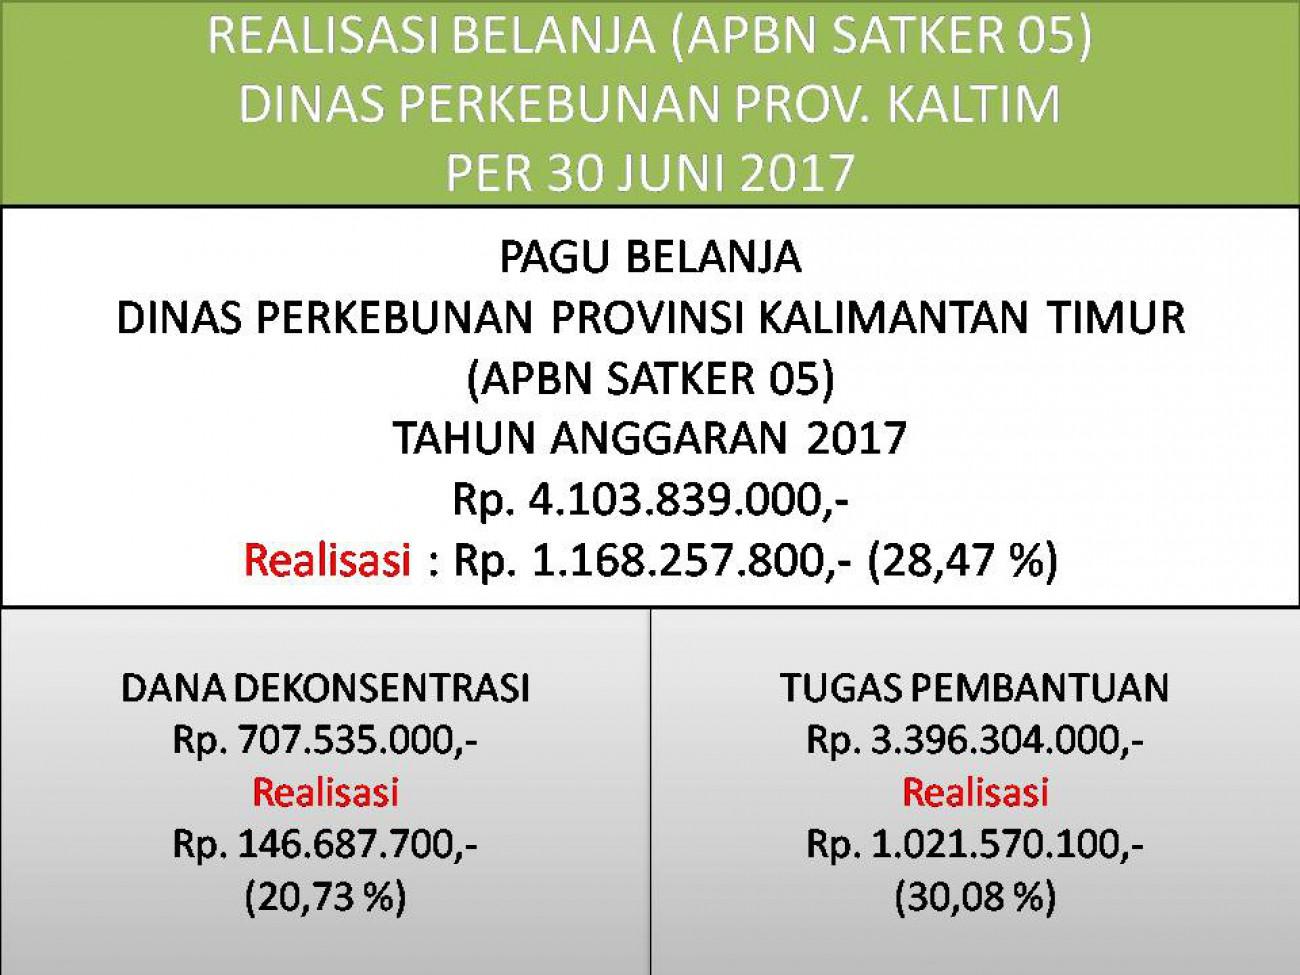 Laporan Realisasi APBN Satker 05 (Direktorat Jenderal Perkebunan) Dinas Perkebunan Prov. Kaltim Bulan Juni 2017